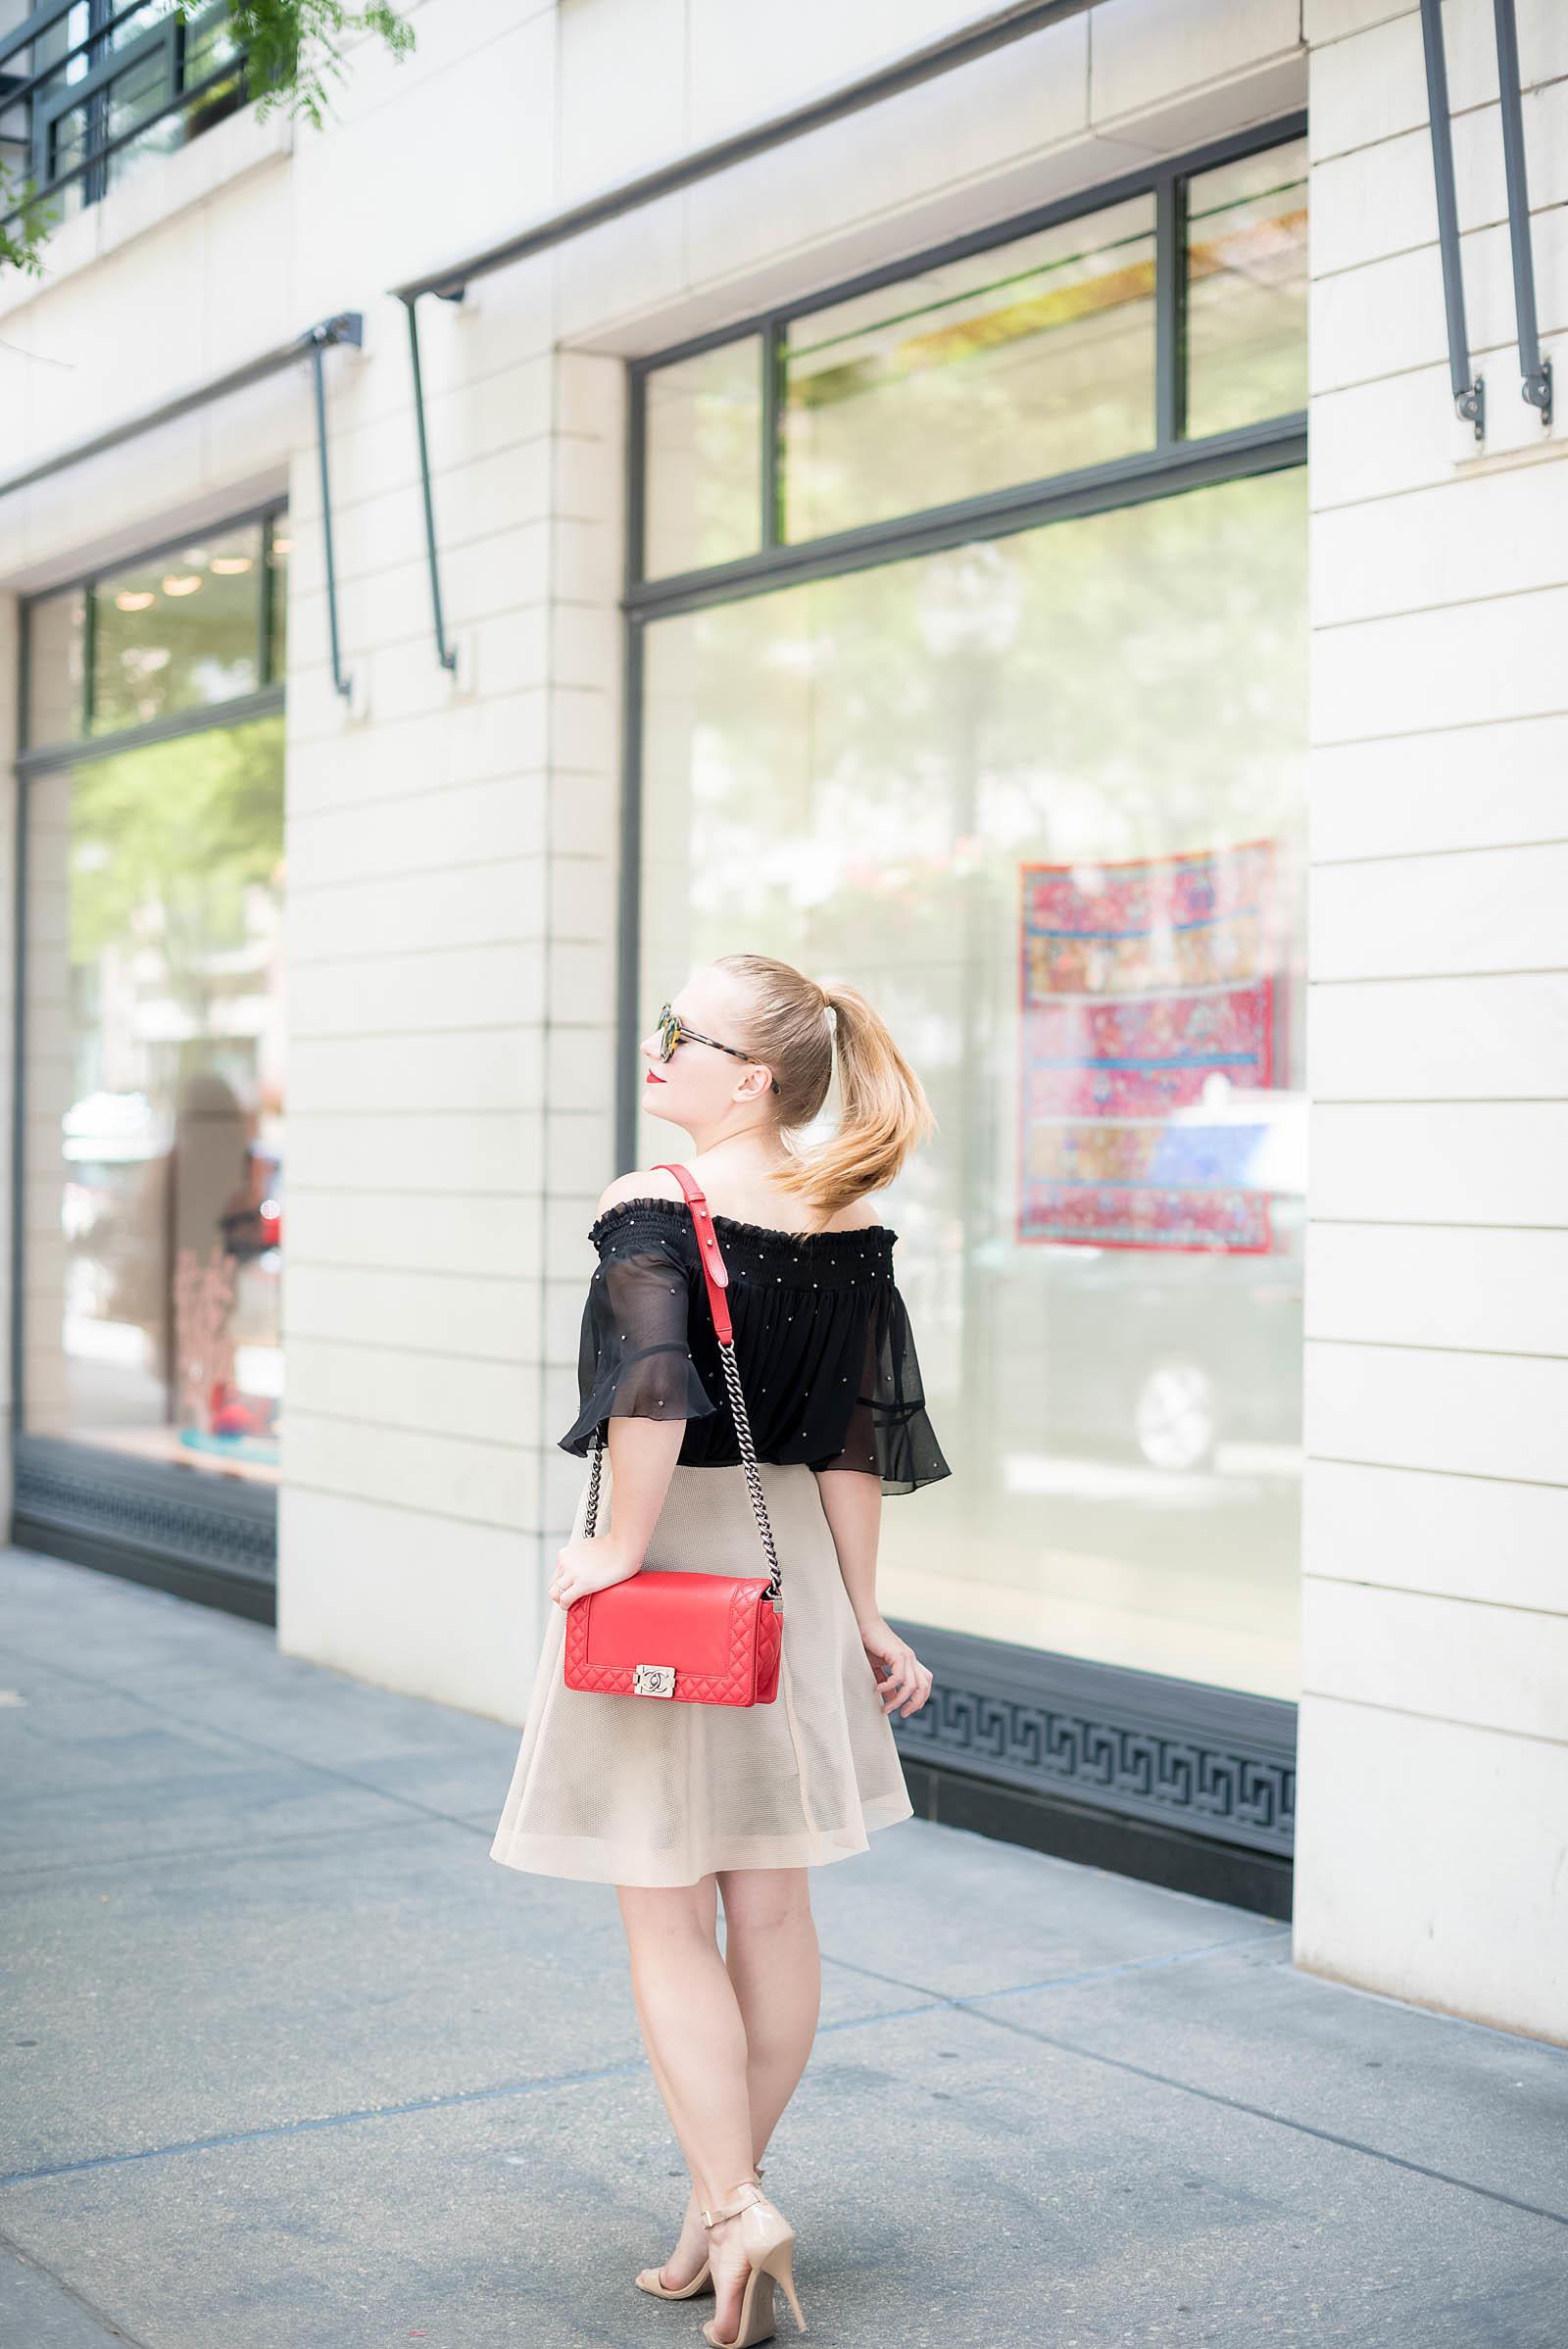 Chanel Red Boy Bag Topshop Zara Red Lips